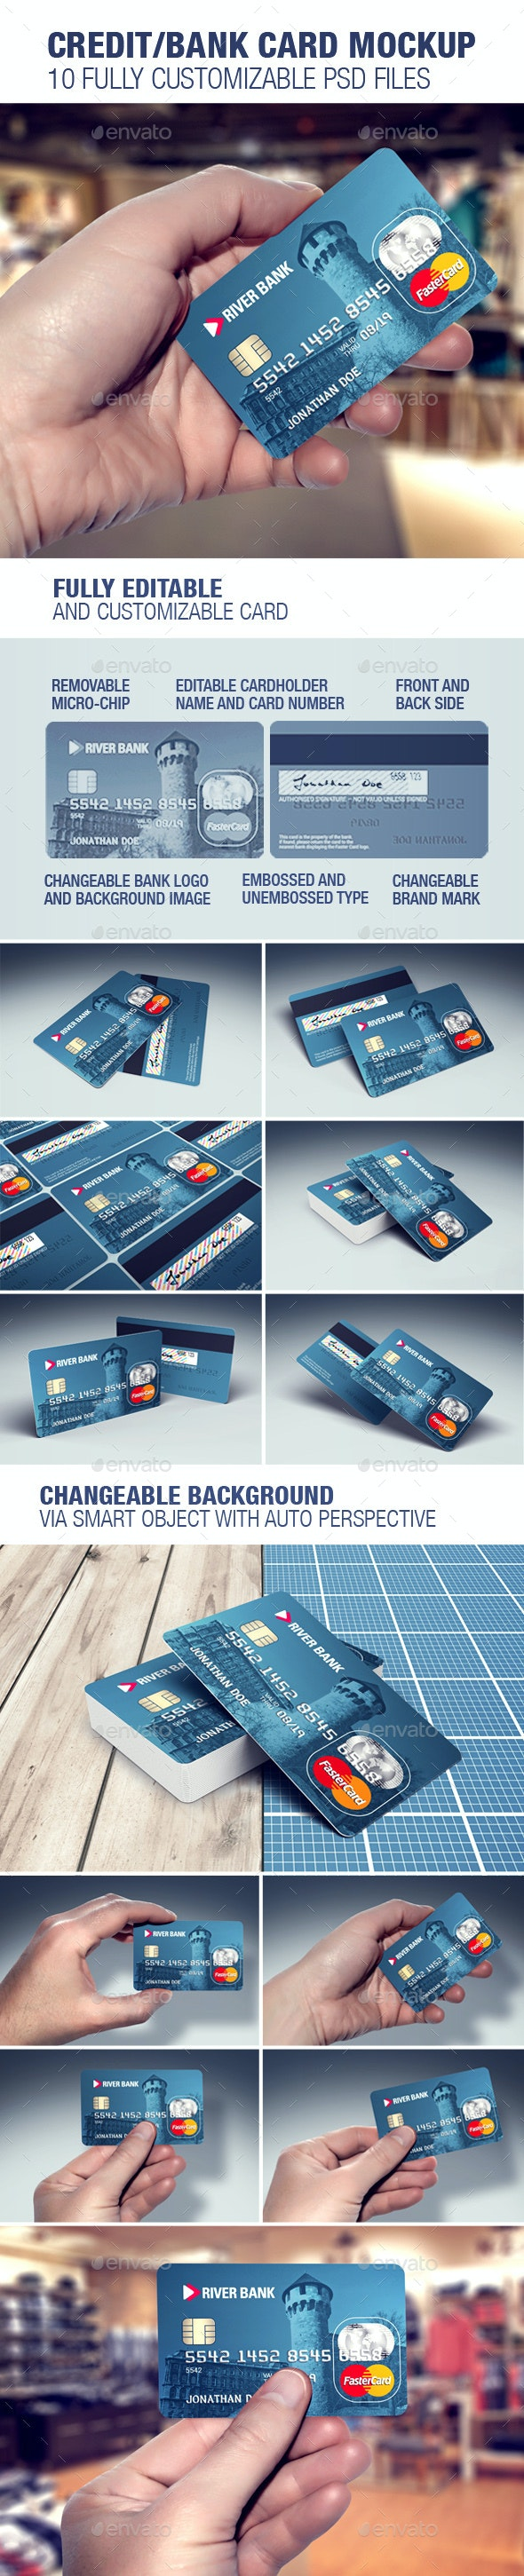 Credit/Bank Card Template & Mockup - Miscellaneous Print